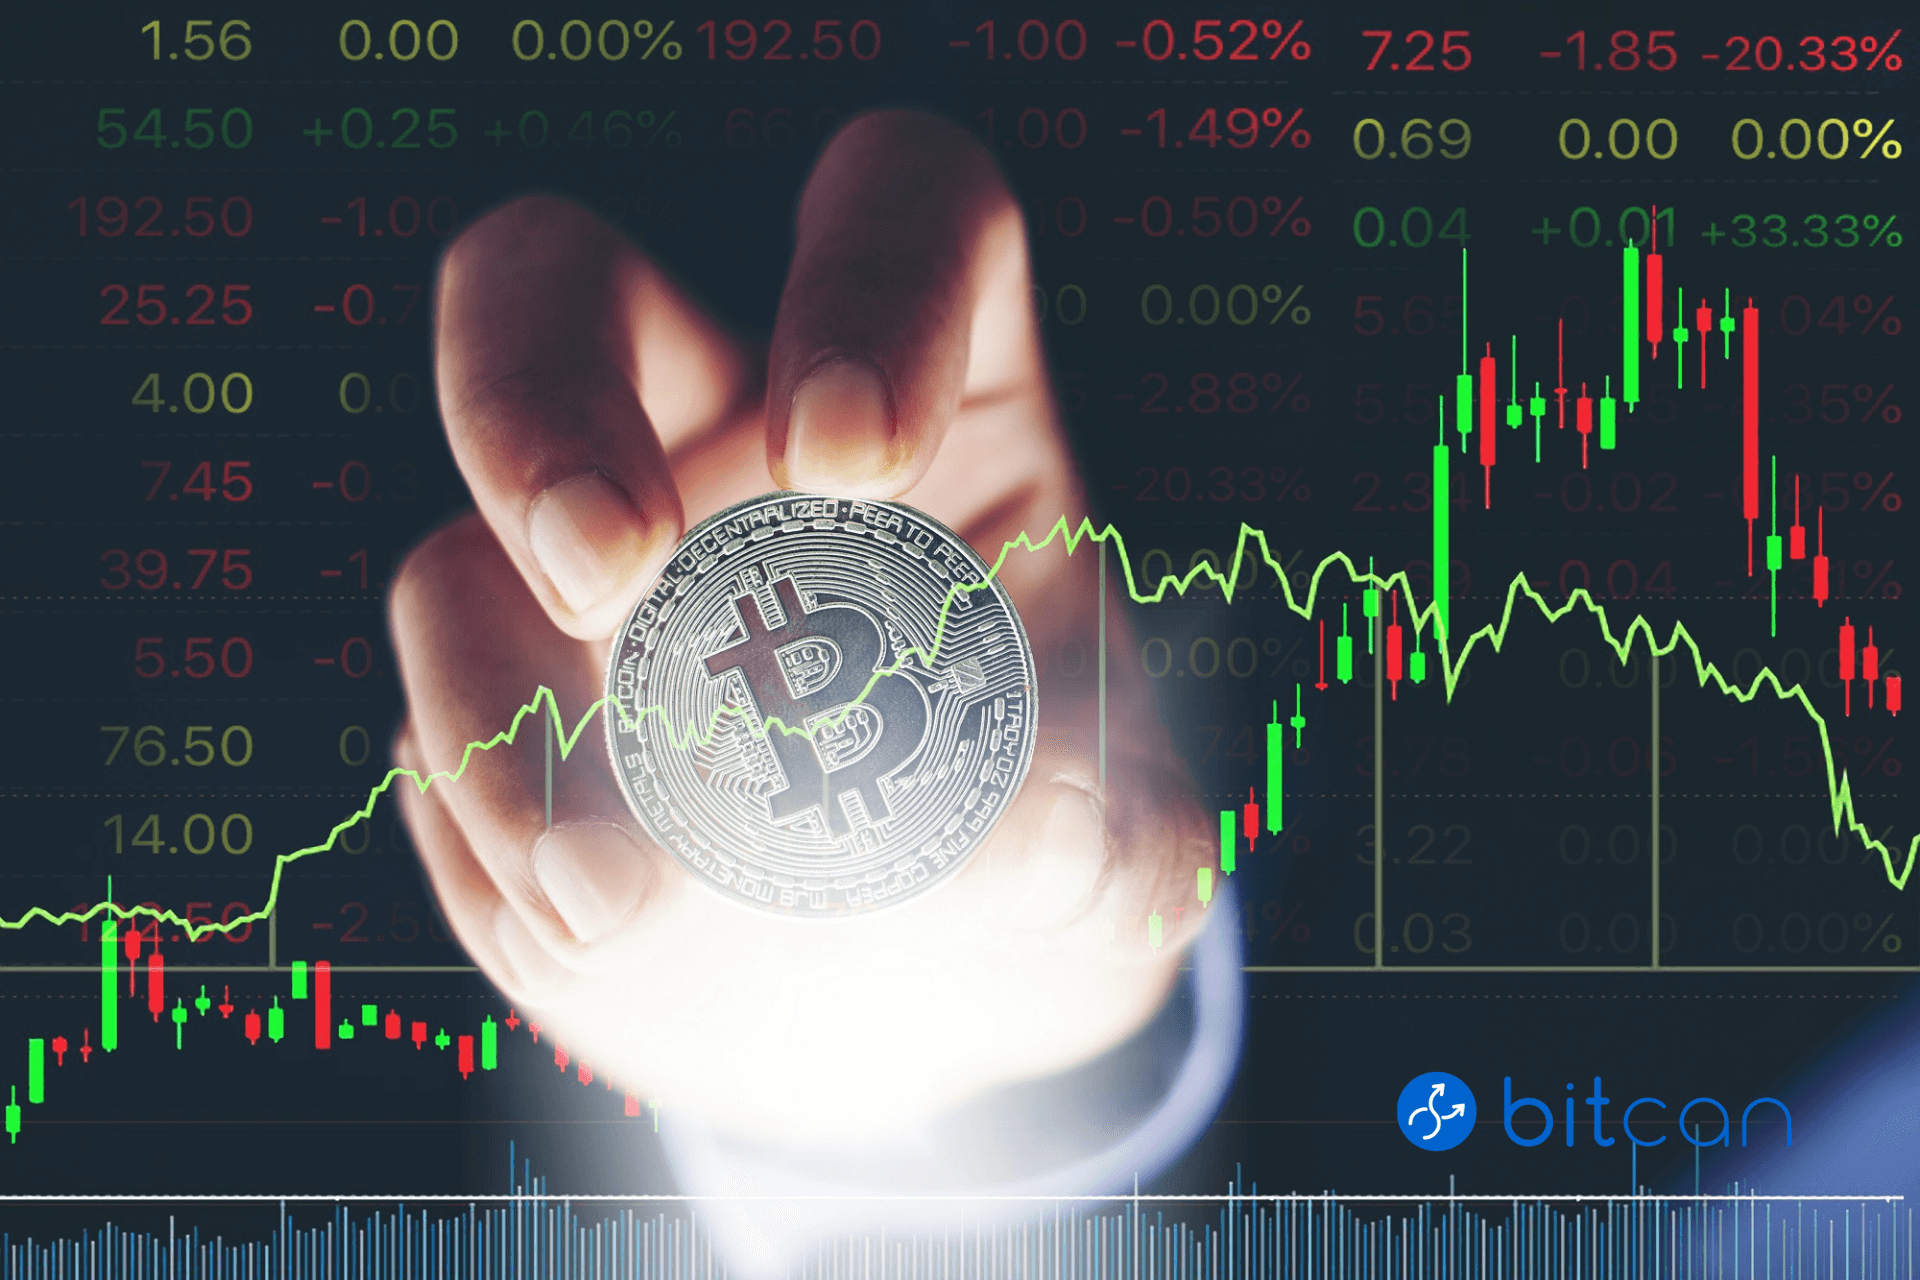 Spekulacja bitcoins losing betting slip on fire